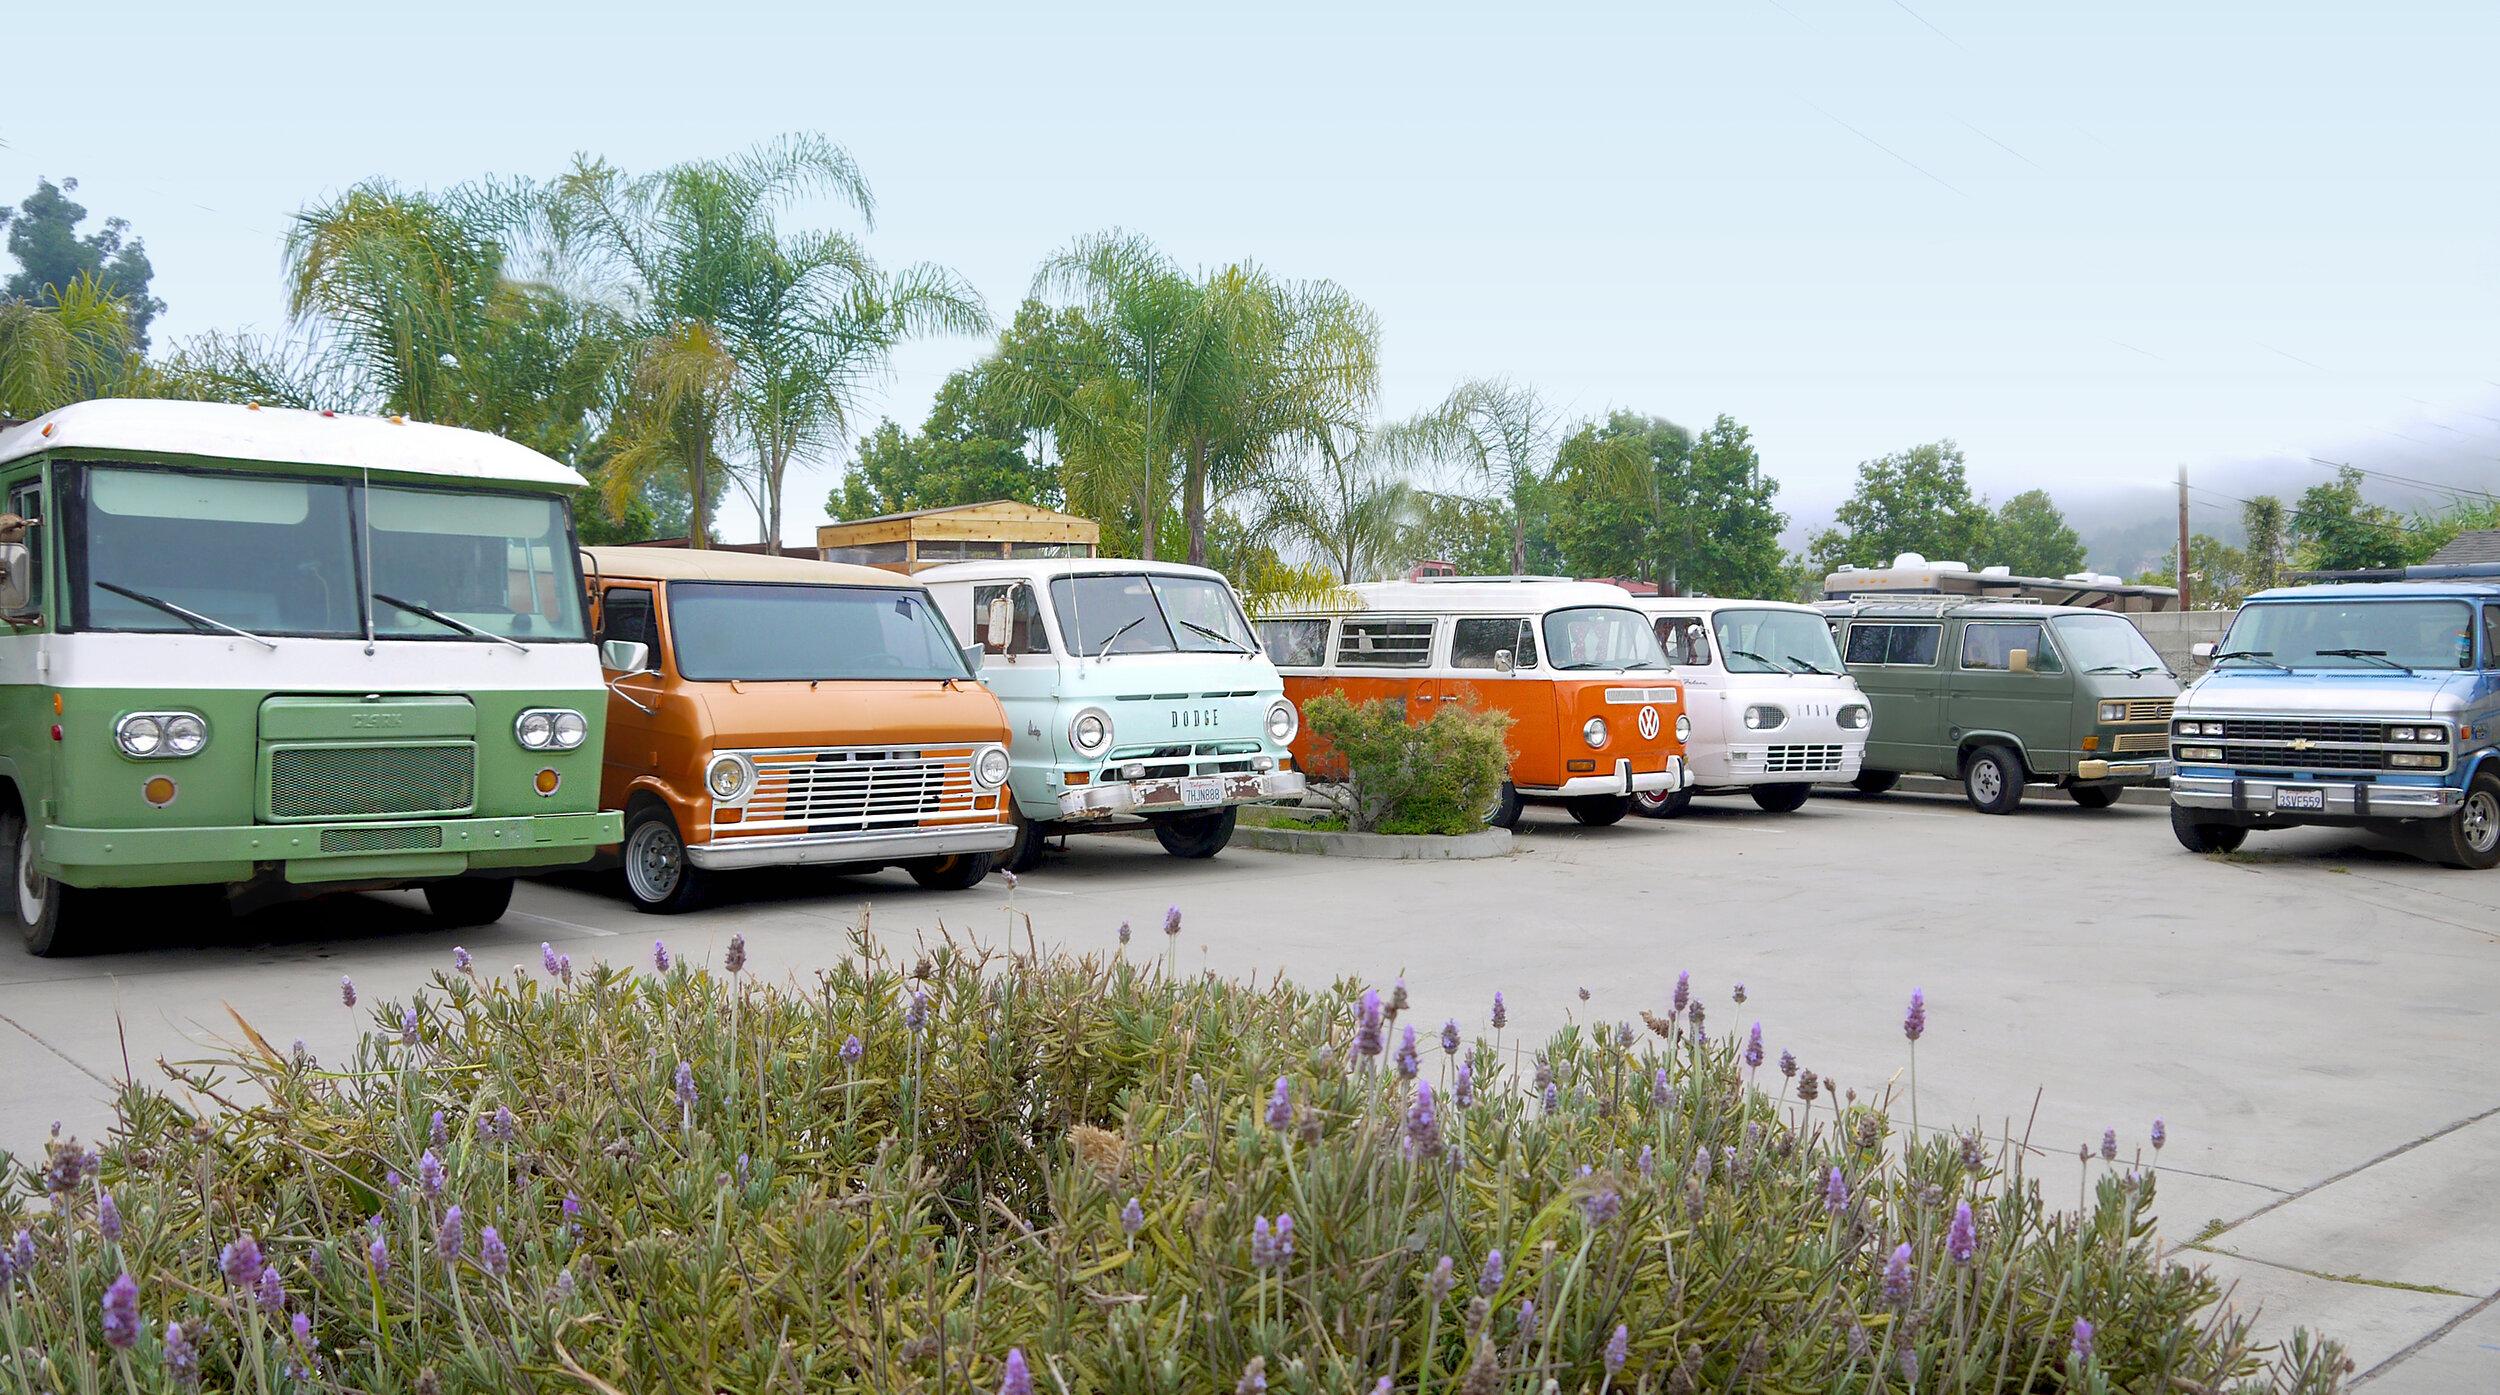 Epoch Restorations and Adventures Vintage Van and Vintage Camper Rentals and Restorations Ventura Ojai Los Angeles Santa Barbara Malibu cropped.jpg